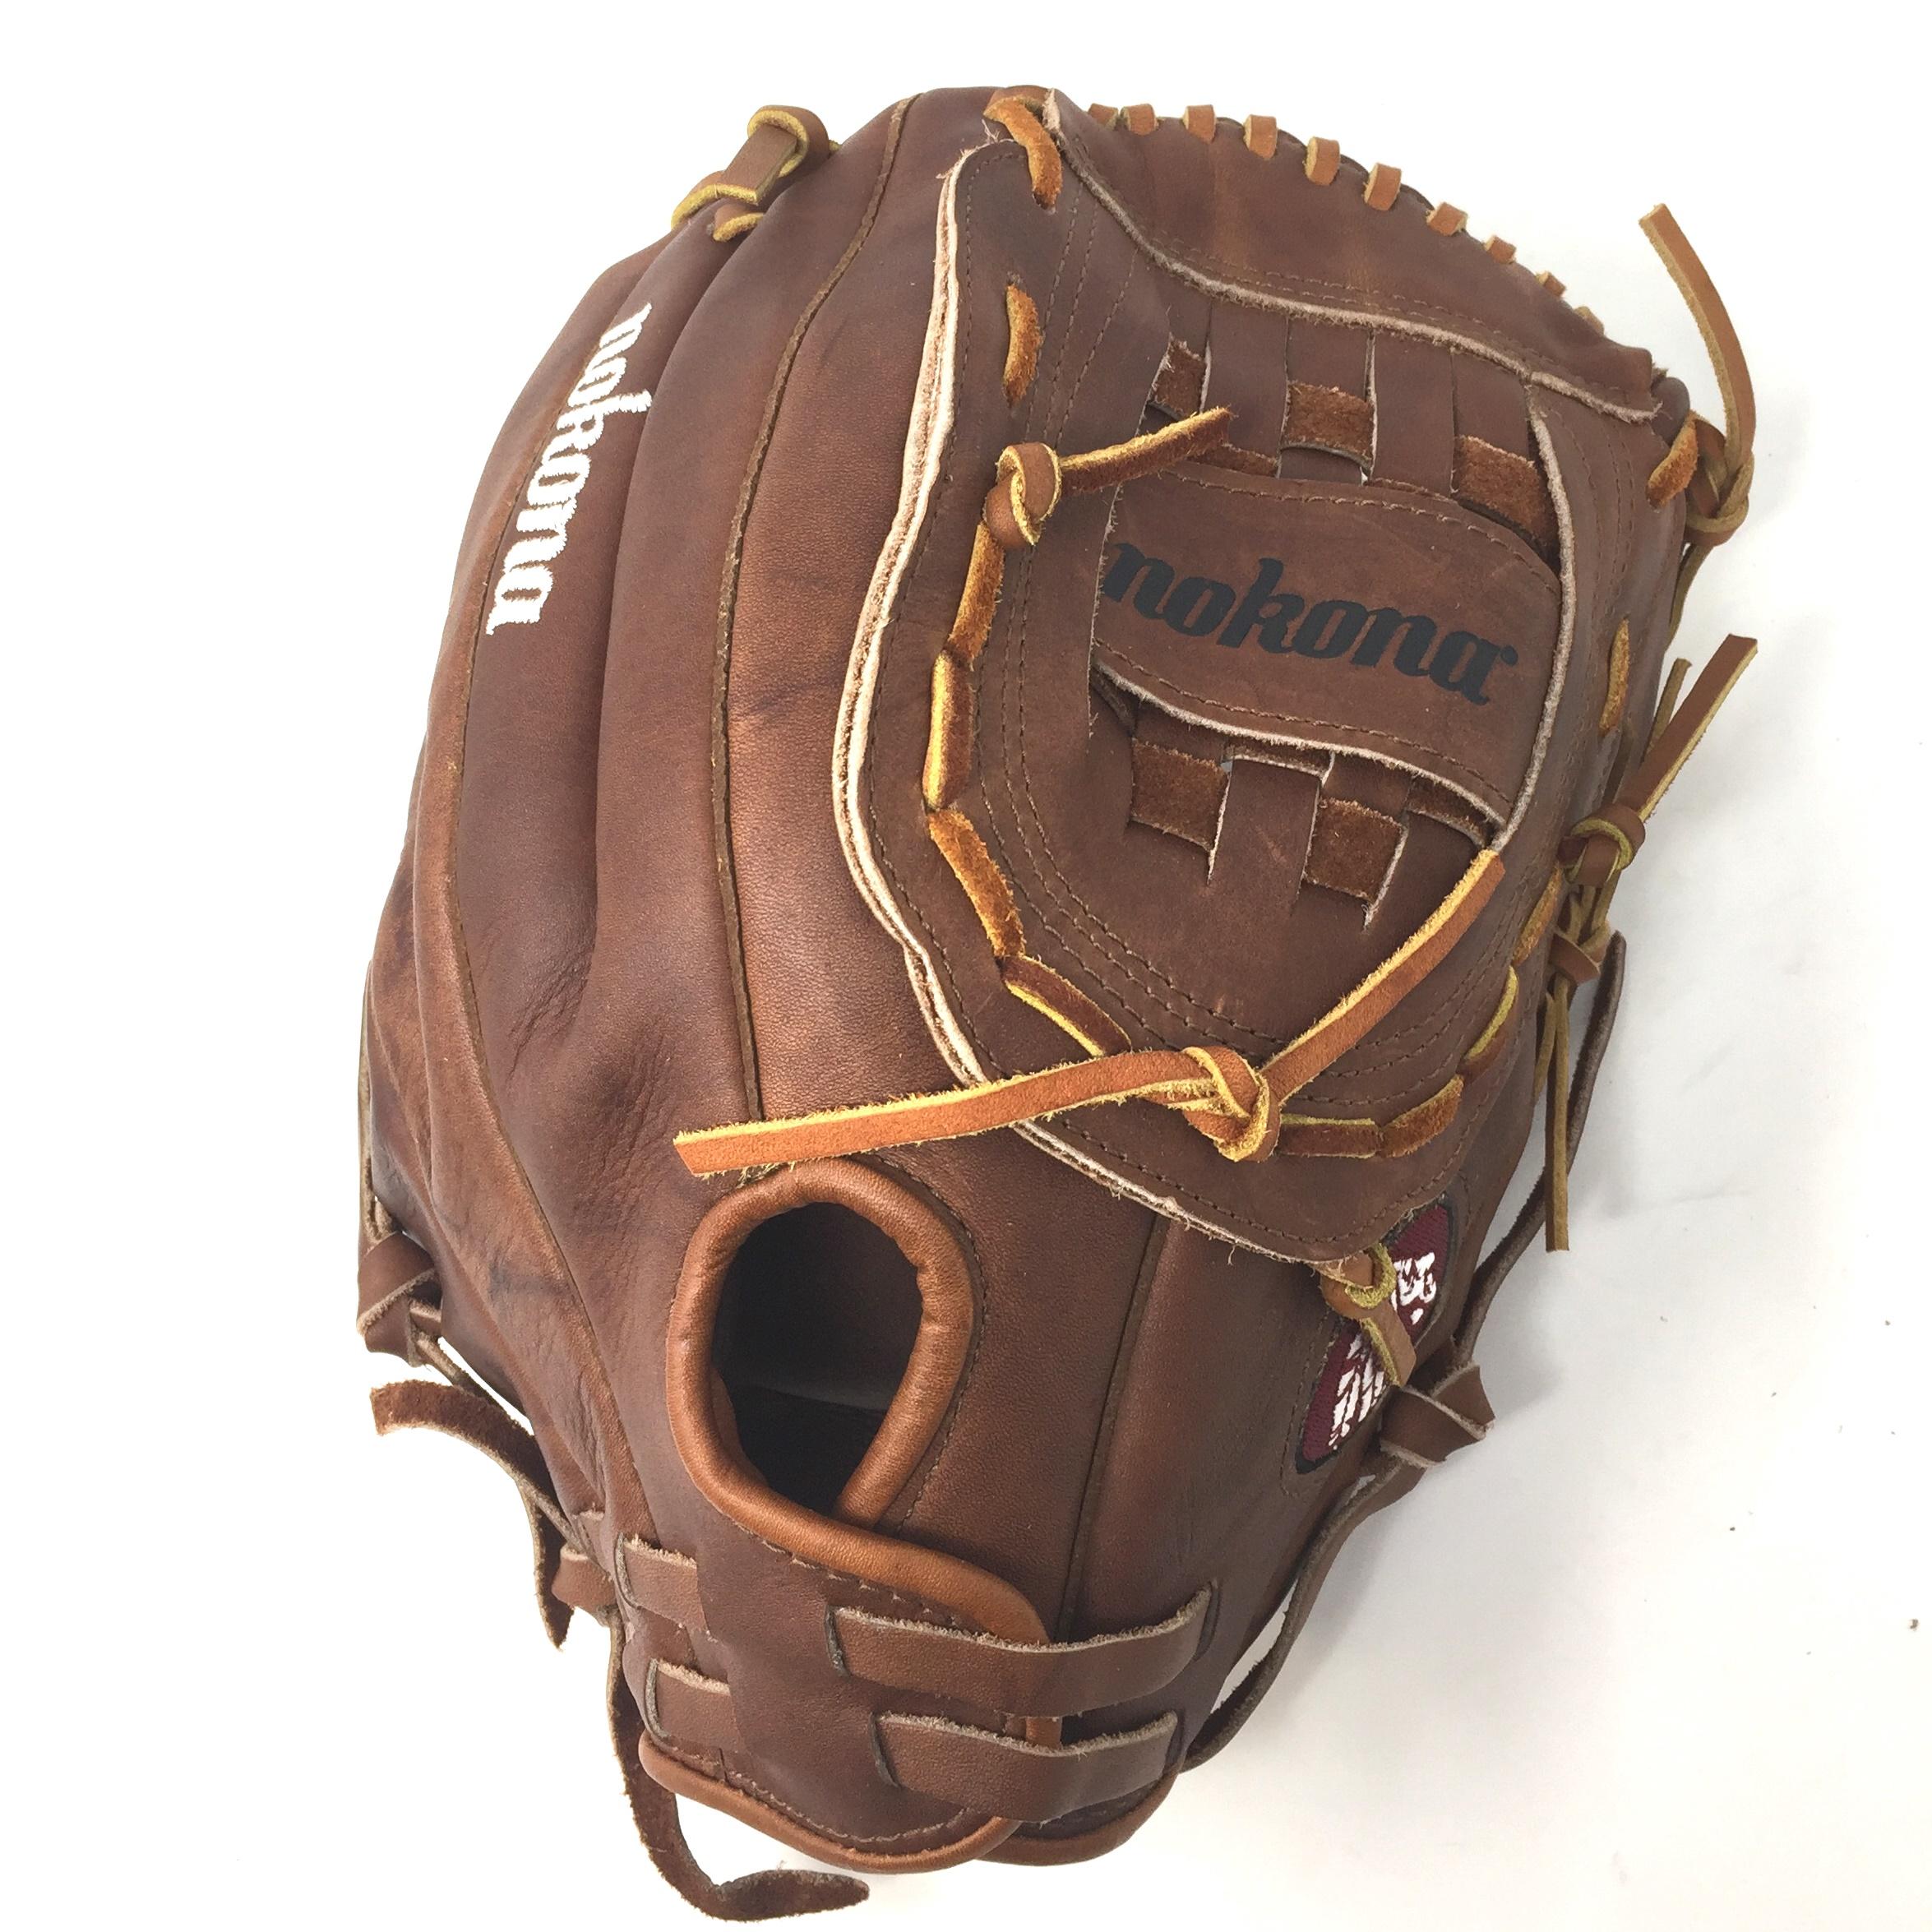 nokona-classic-walnut-13-softball-glove-right-handed-throw-size-13 WS-1300C-RightHandedThrow Nokona 808808889663 Nokona Classic Walnut 13 Softball Glove Right Handed Throw Size 13